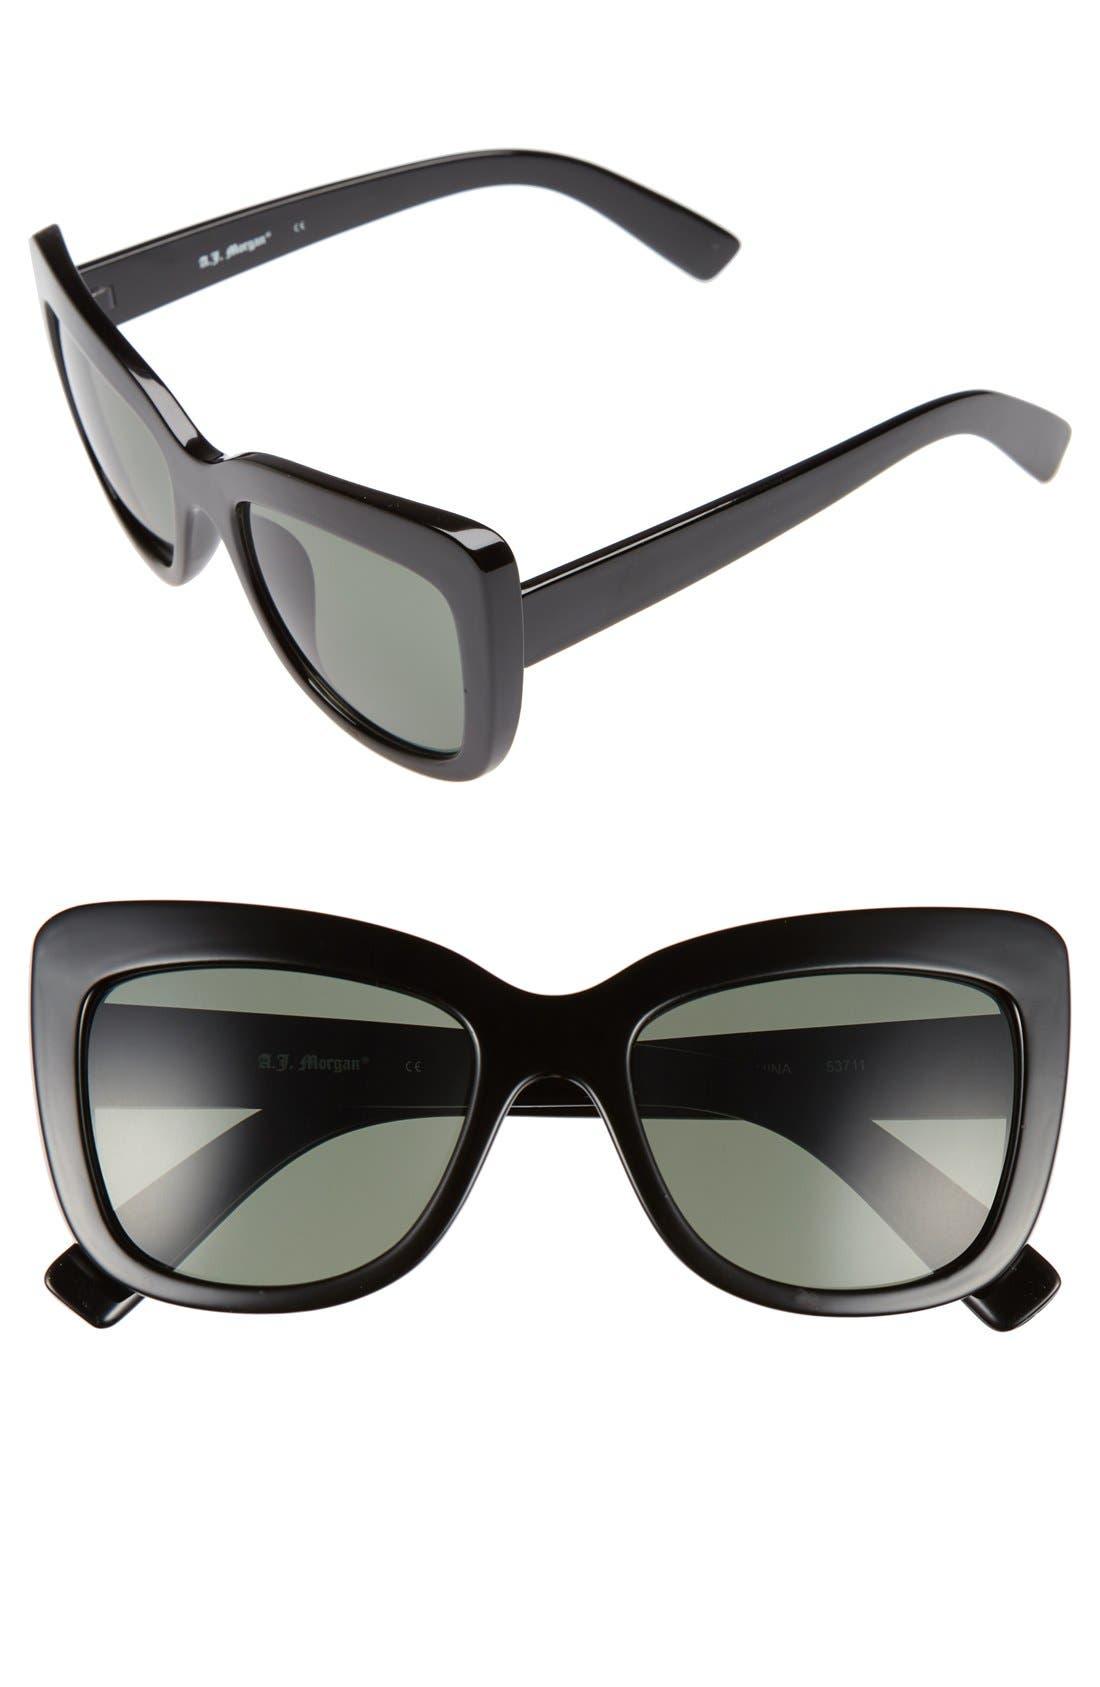 Main Image - A.J. Morgan 'Lift' 50mm Cat Eye Sunglasses